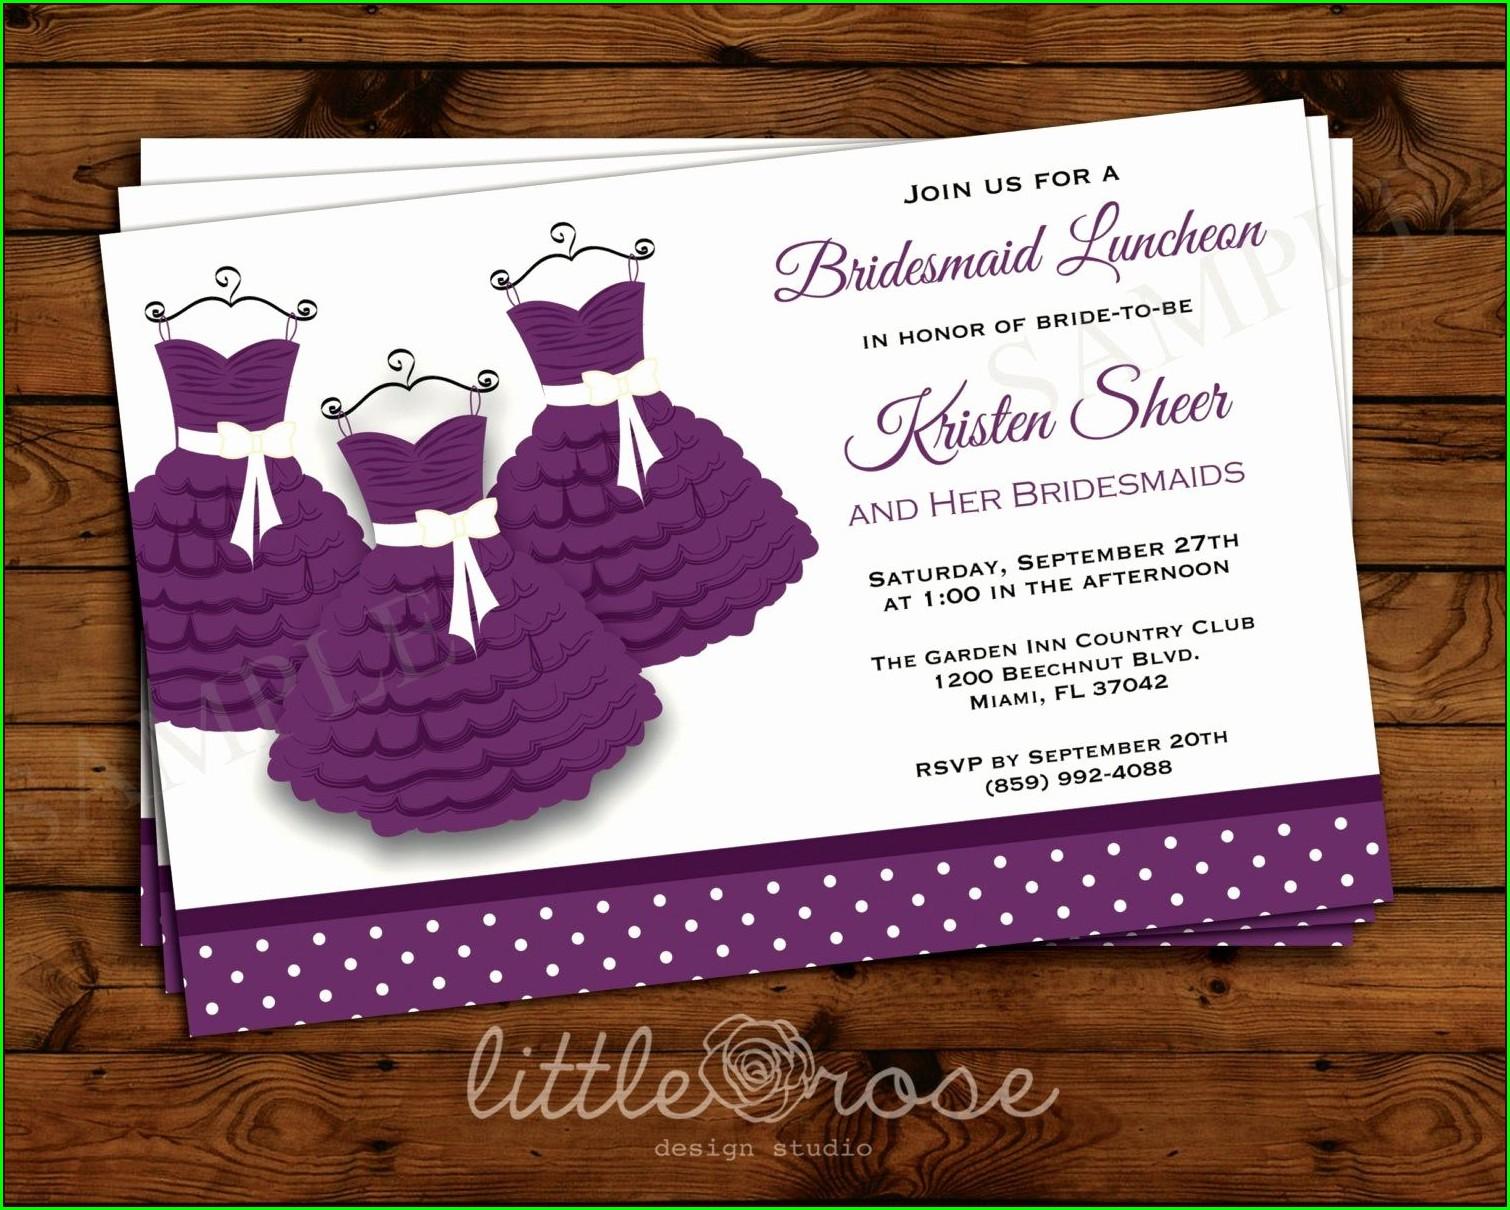 Bridesmaids Luncheon Invitation Wording